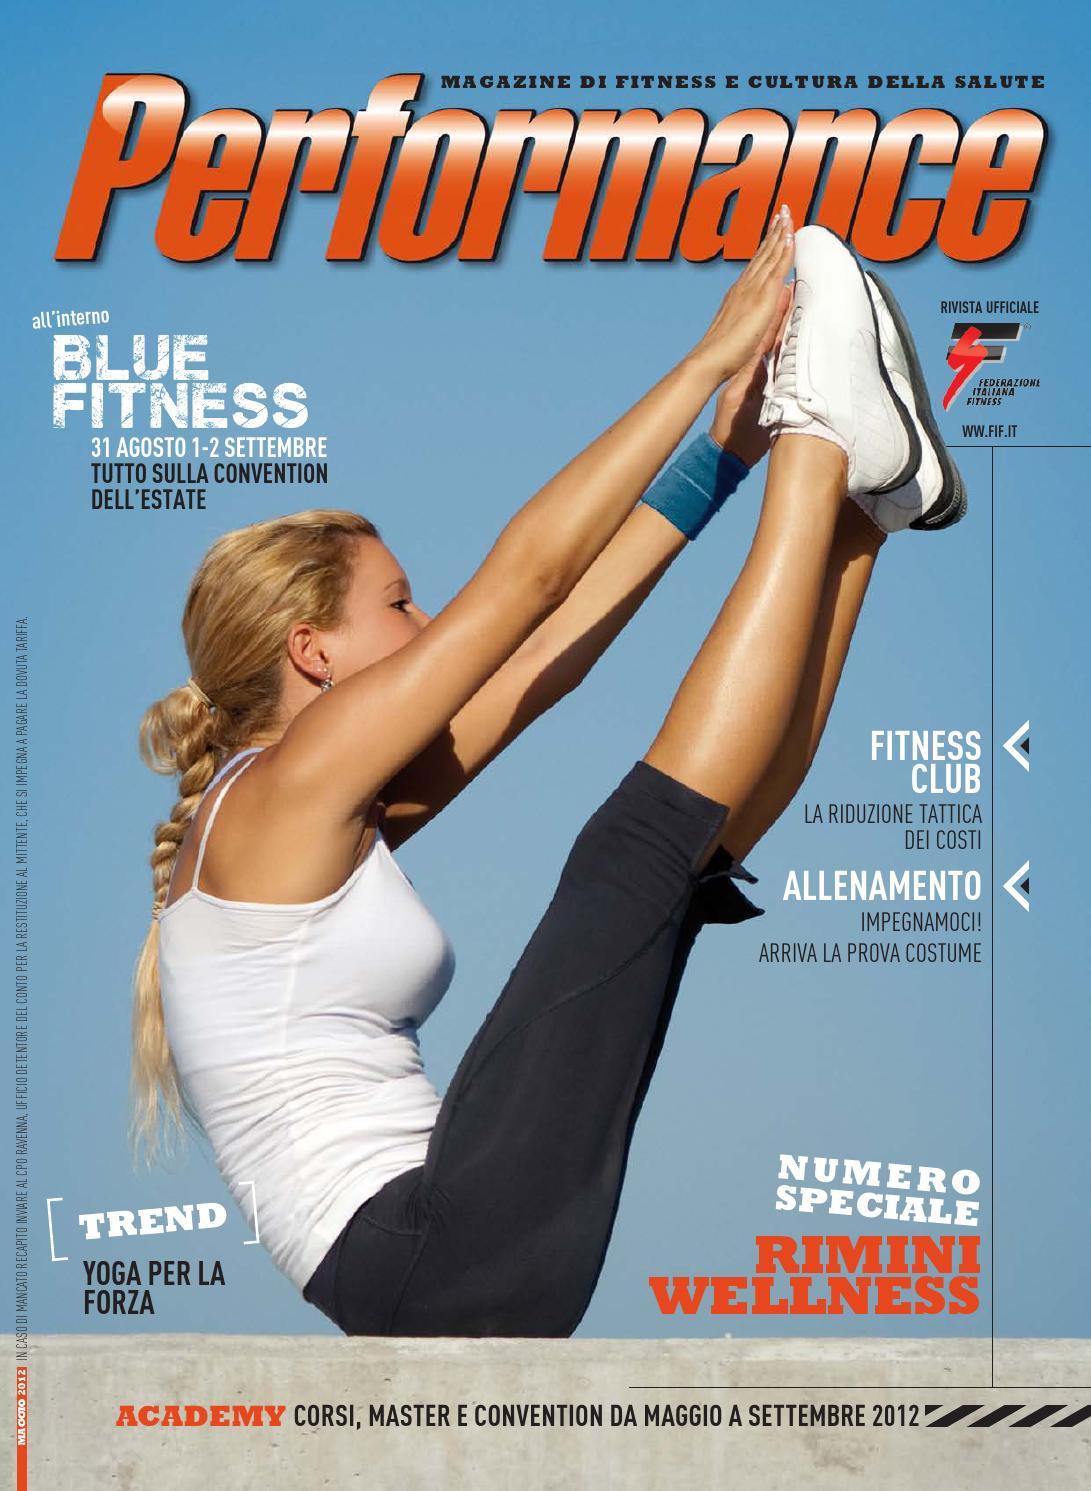 Performance 01 2012 by Federazione Italiana Fitness - issuu 56d88aebe686